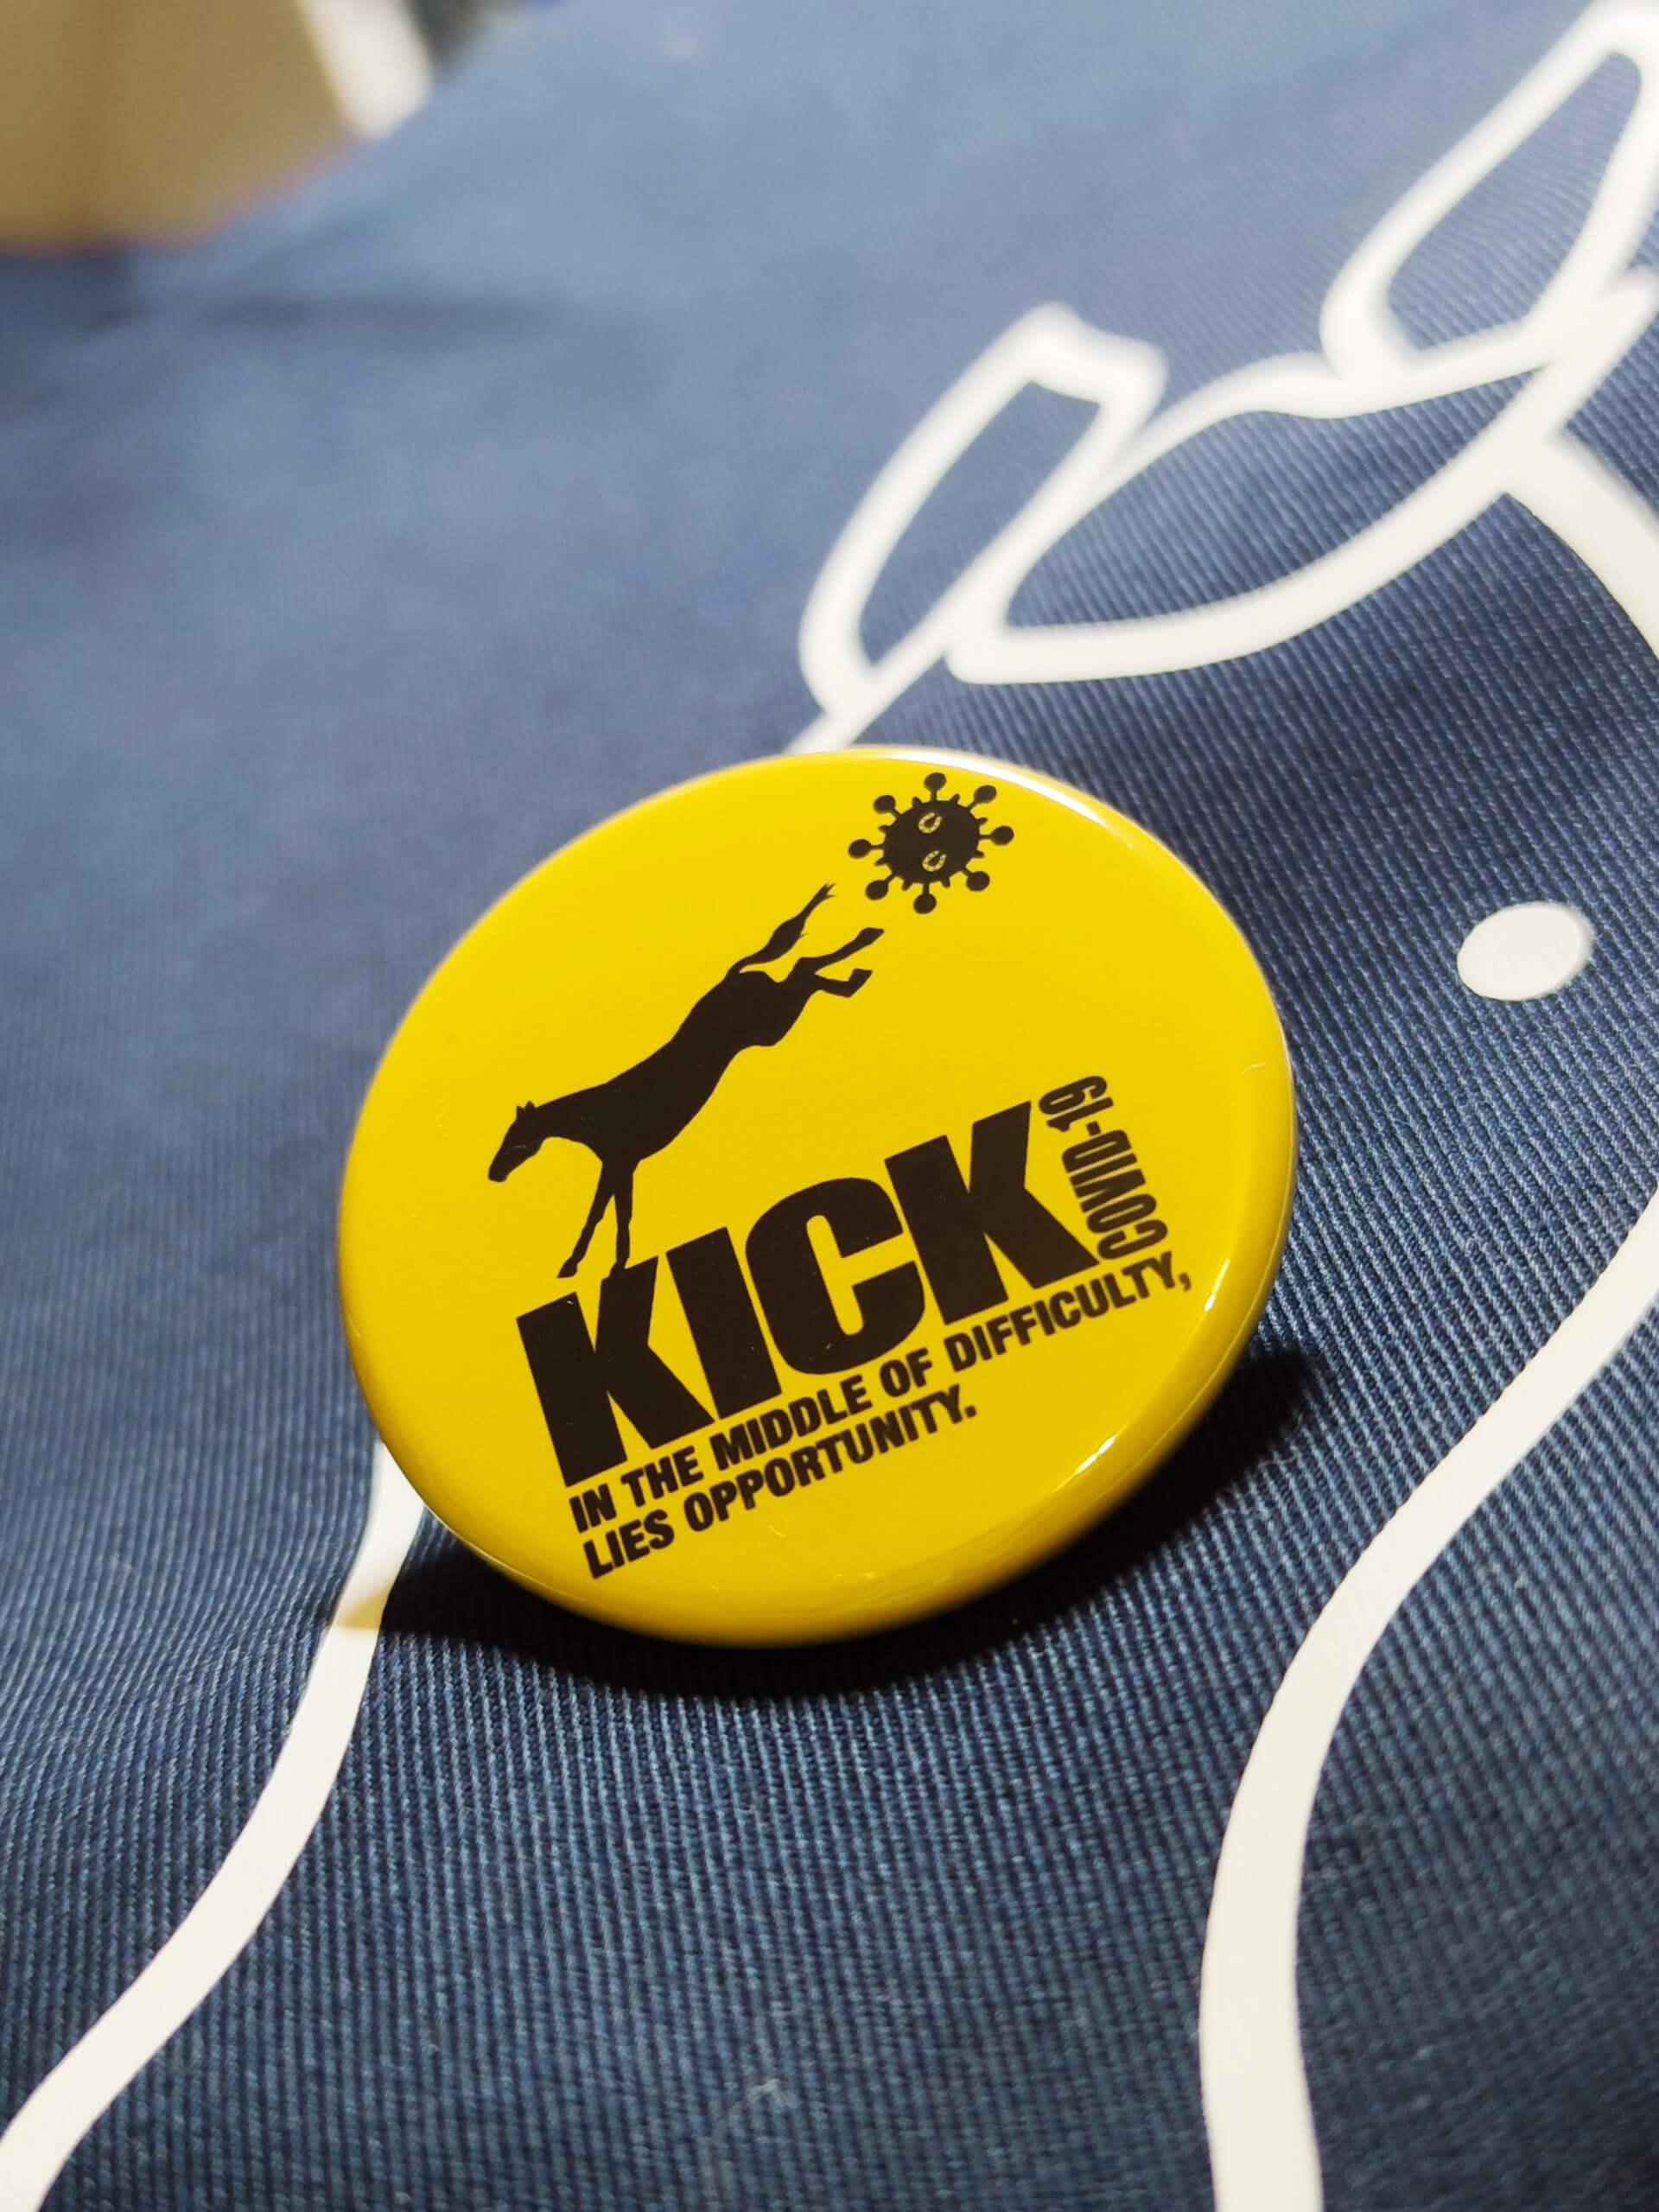 kick!covid19